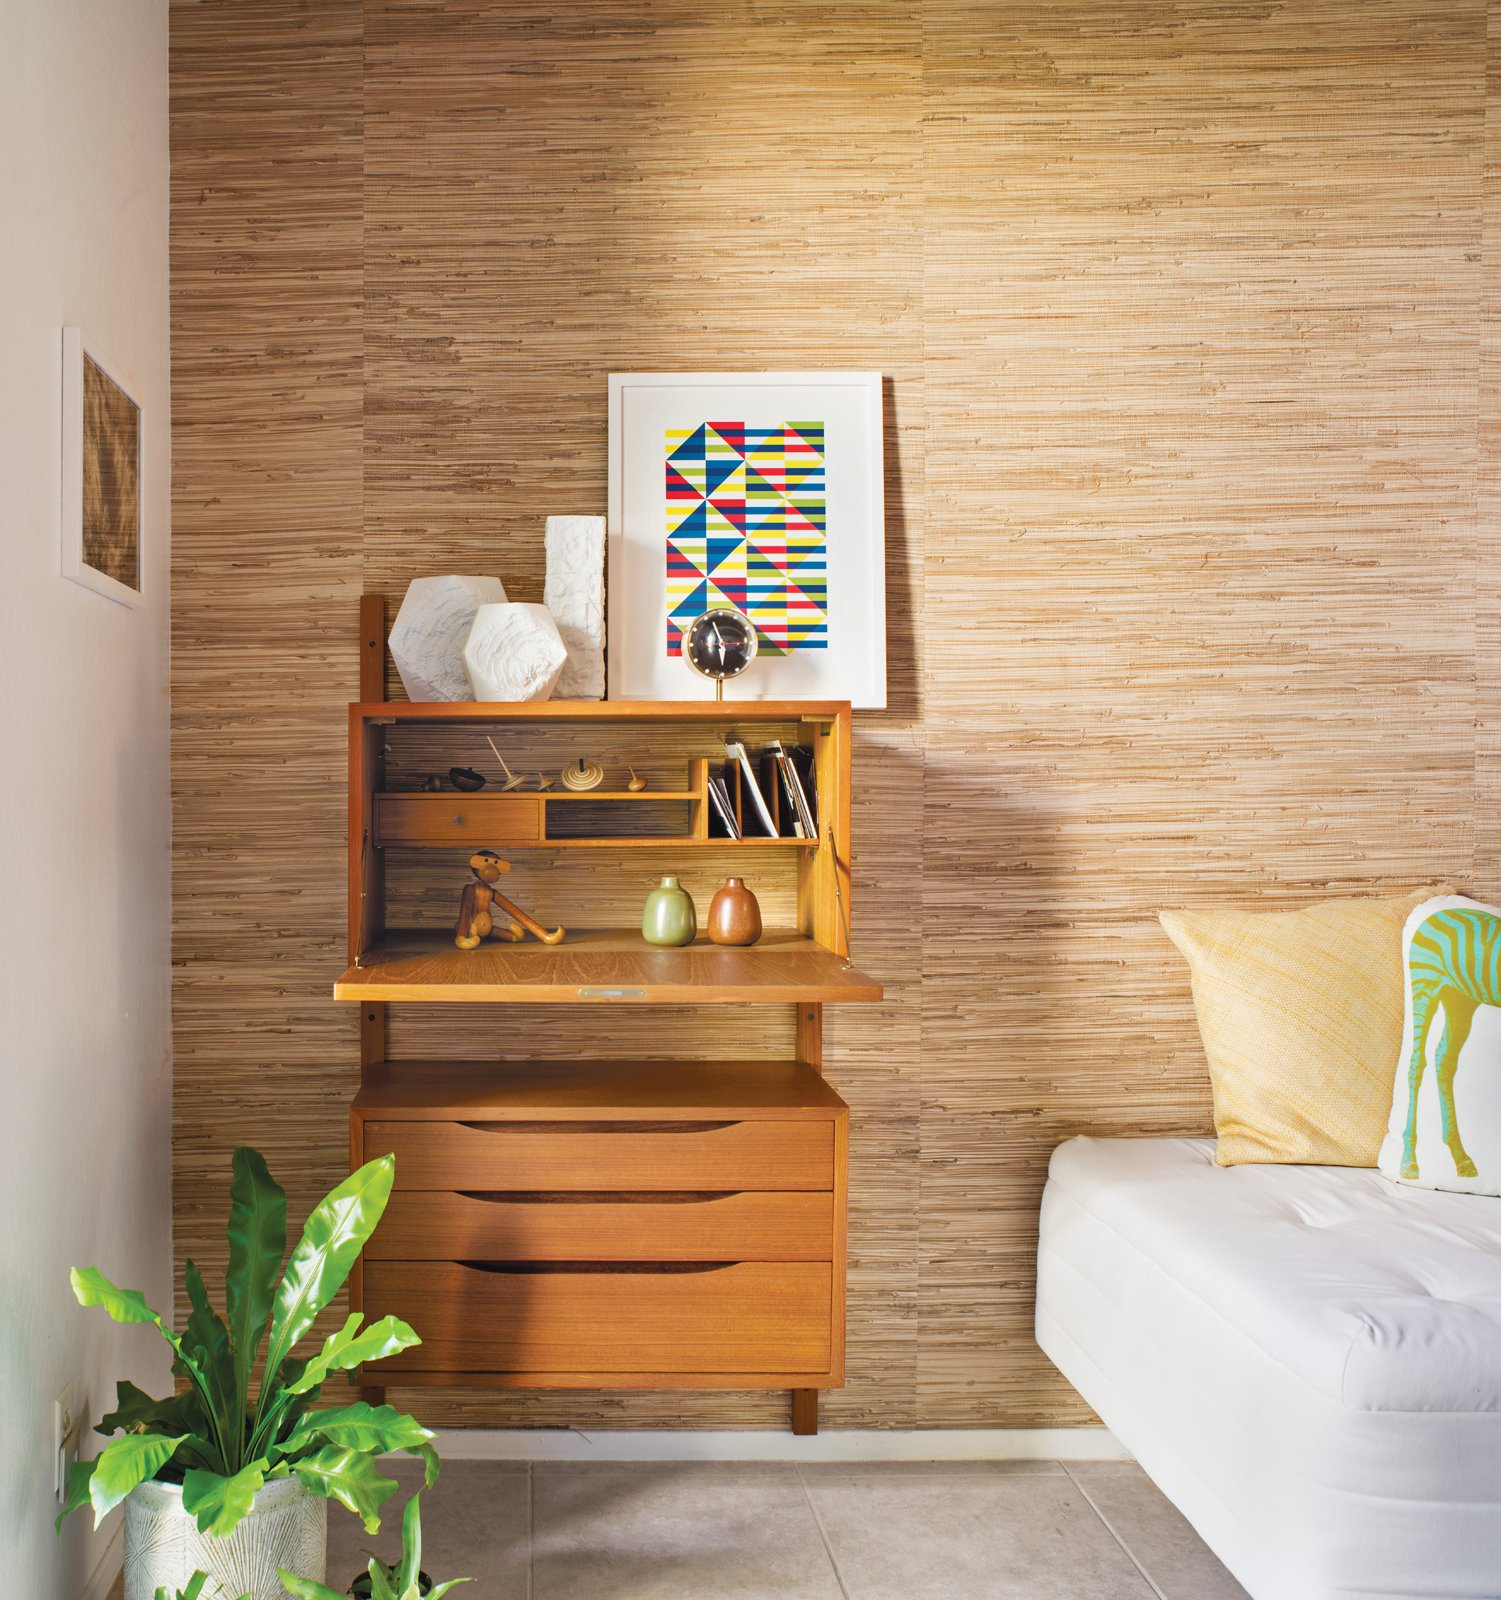 #midcenturymodern #office #smallspaces #bedroom #desk